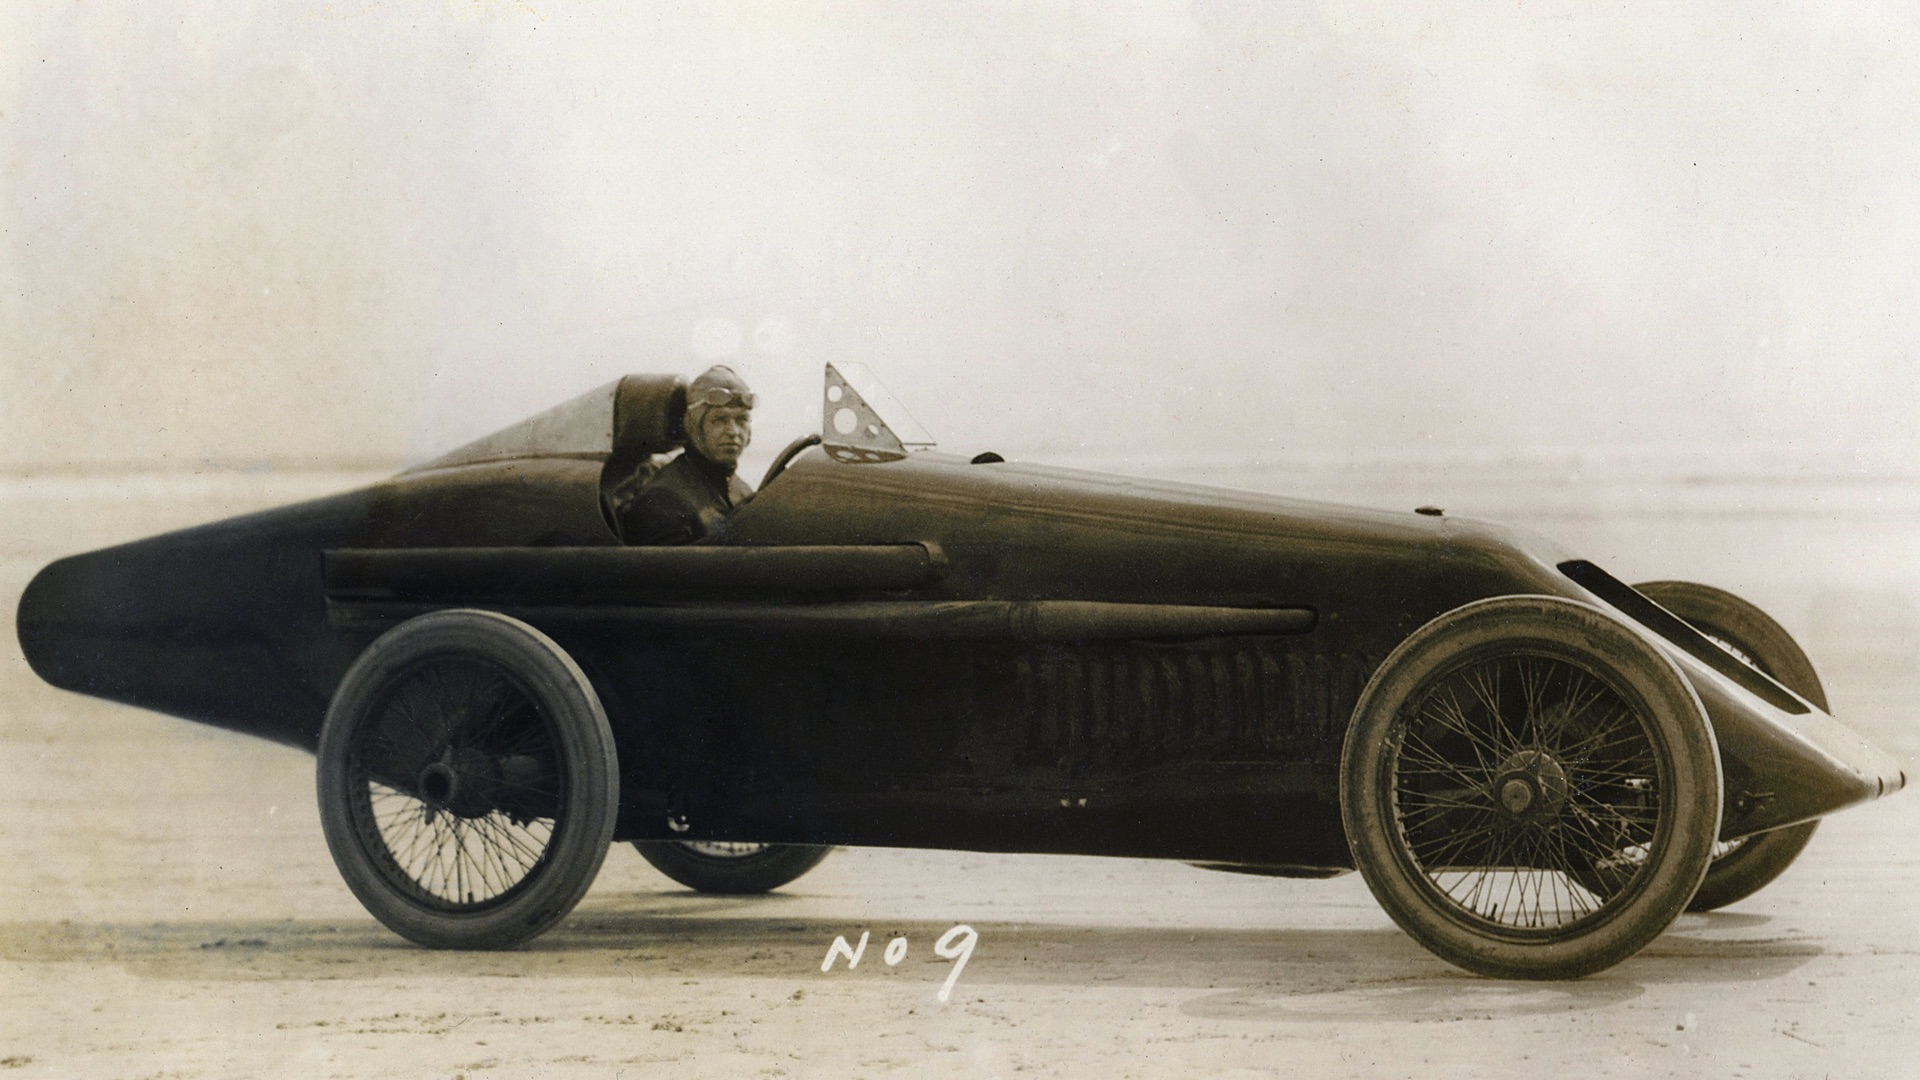 16-cylinder Duesenberg